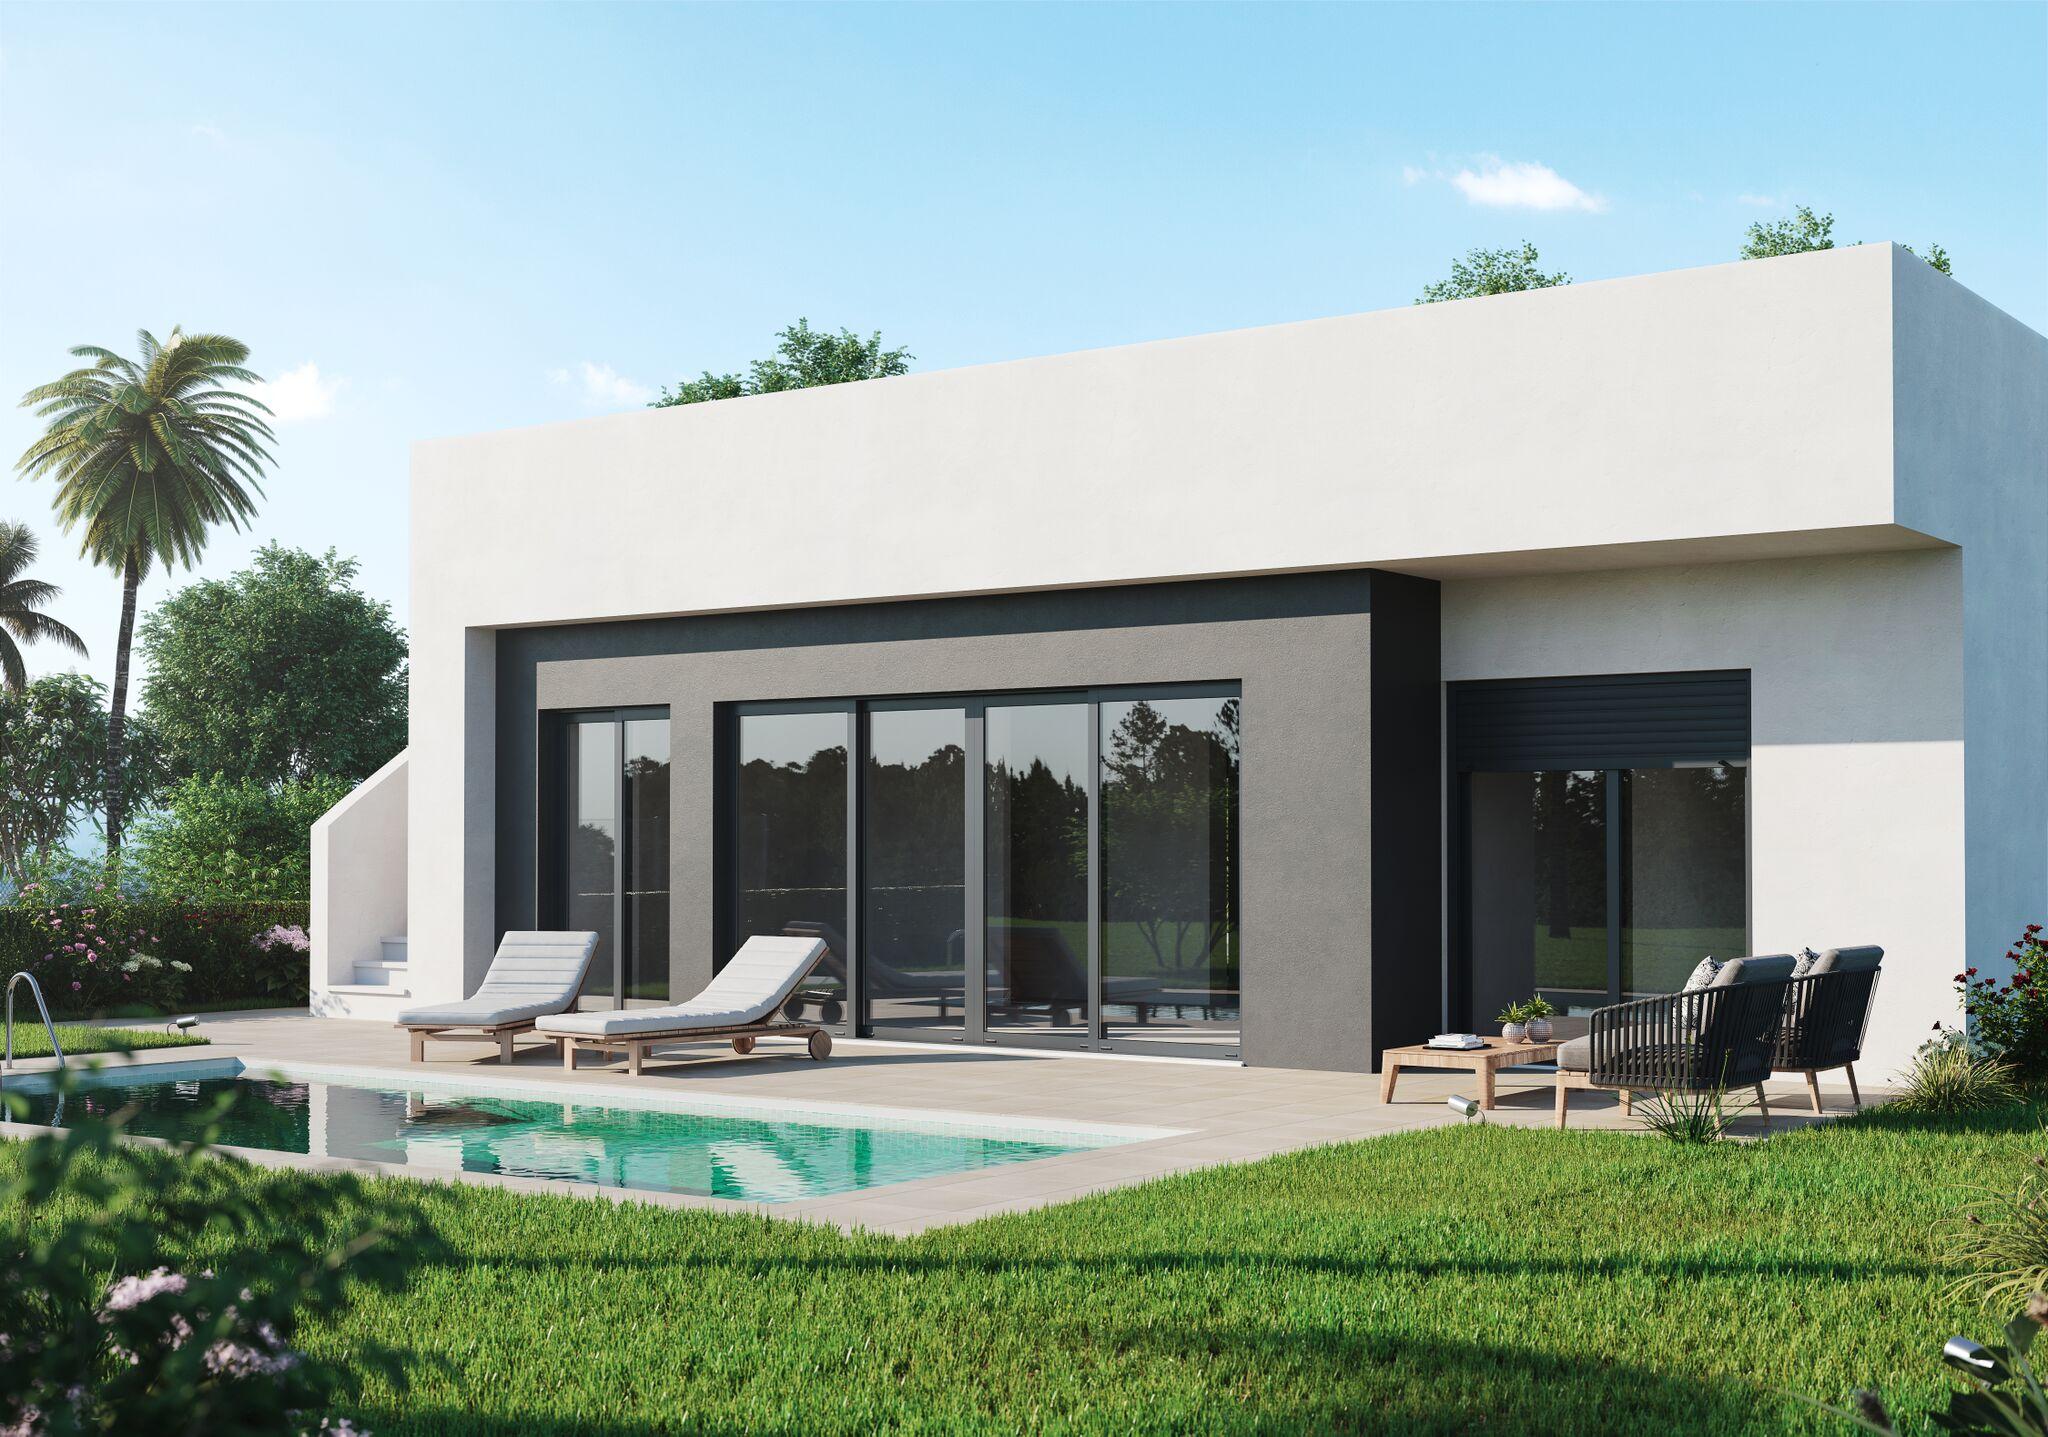 Ref:kf943289 Villa For Sale in Alhama de Murcia